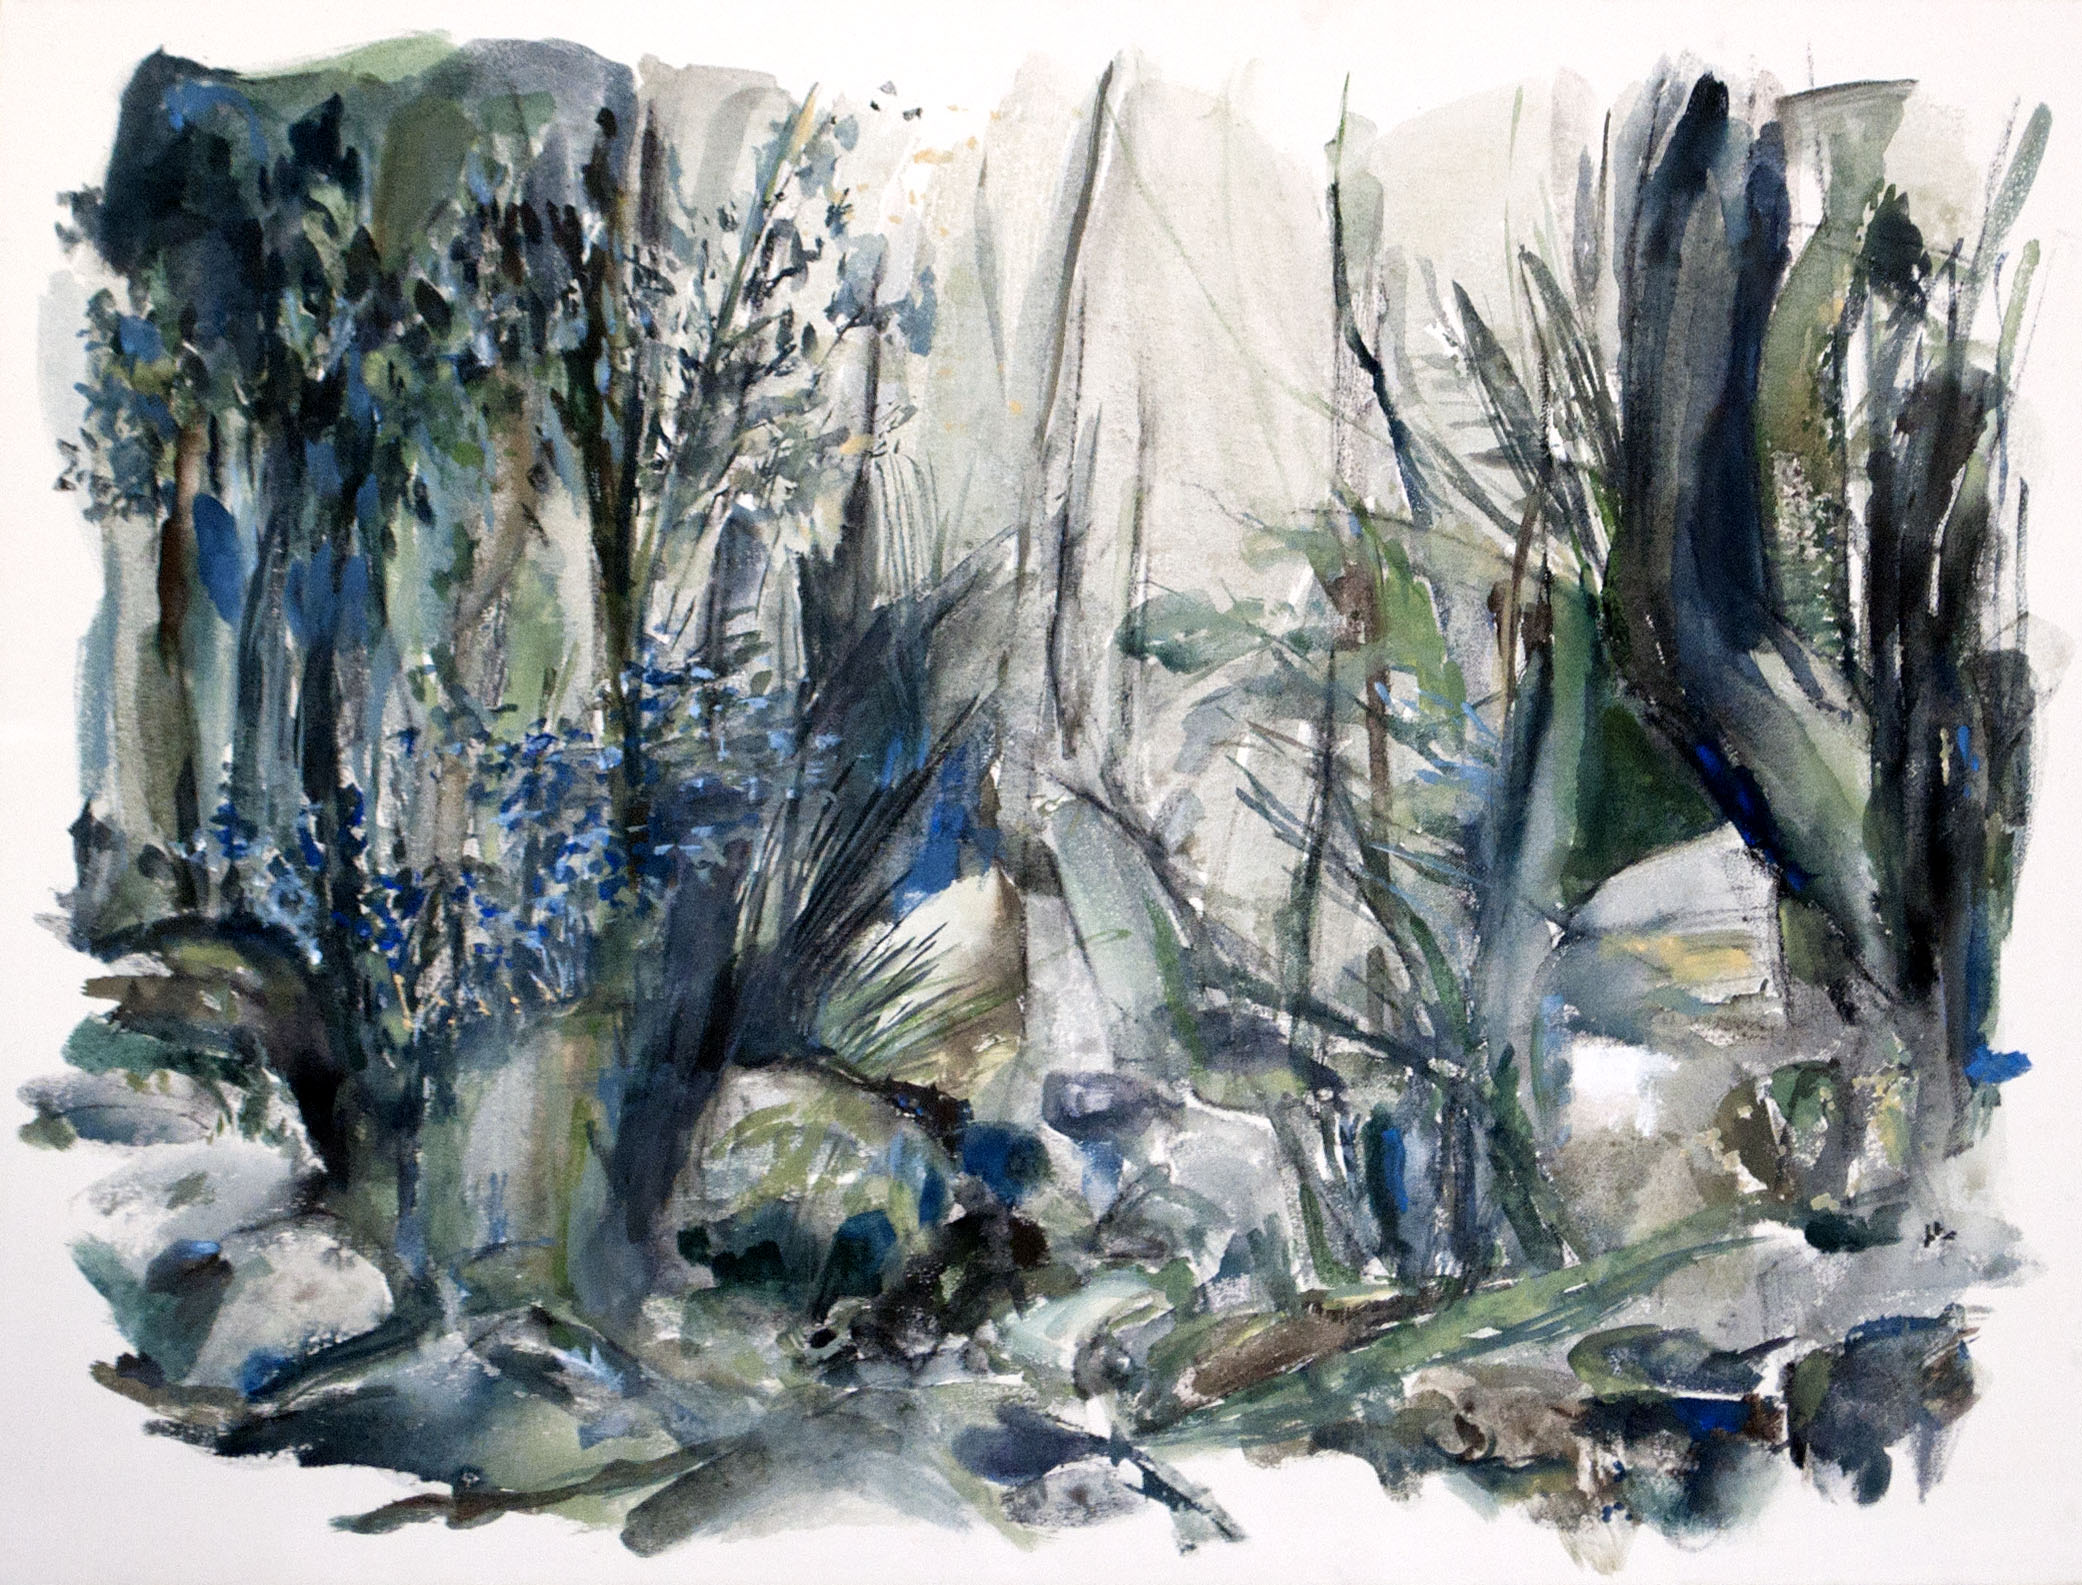 Marais Don Quichotte 1/3, gouache and acrylic on canvas, 76 x 102 cm, 2016